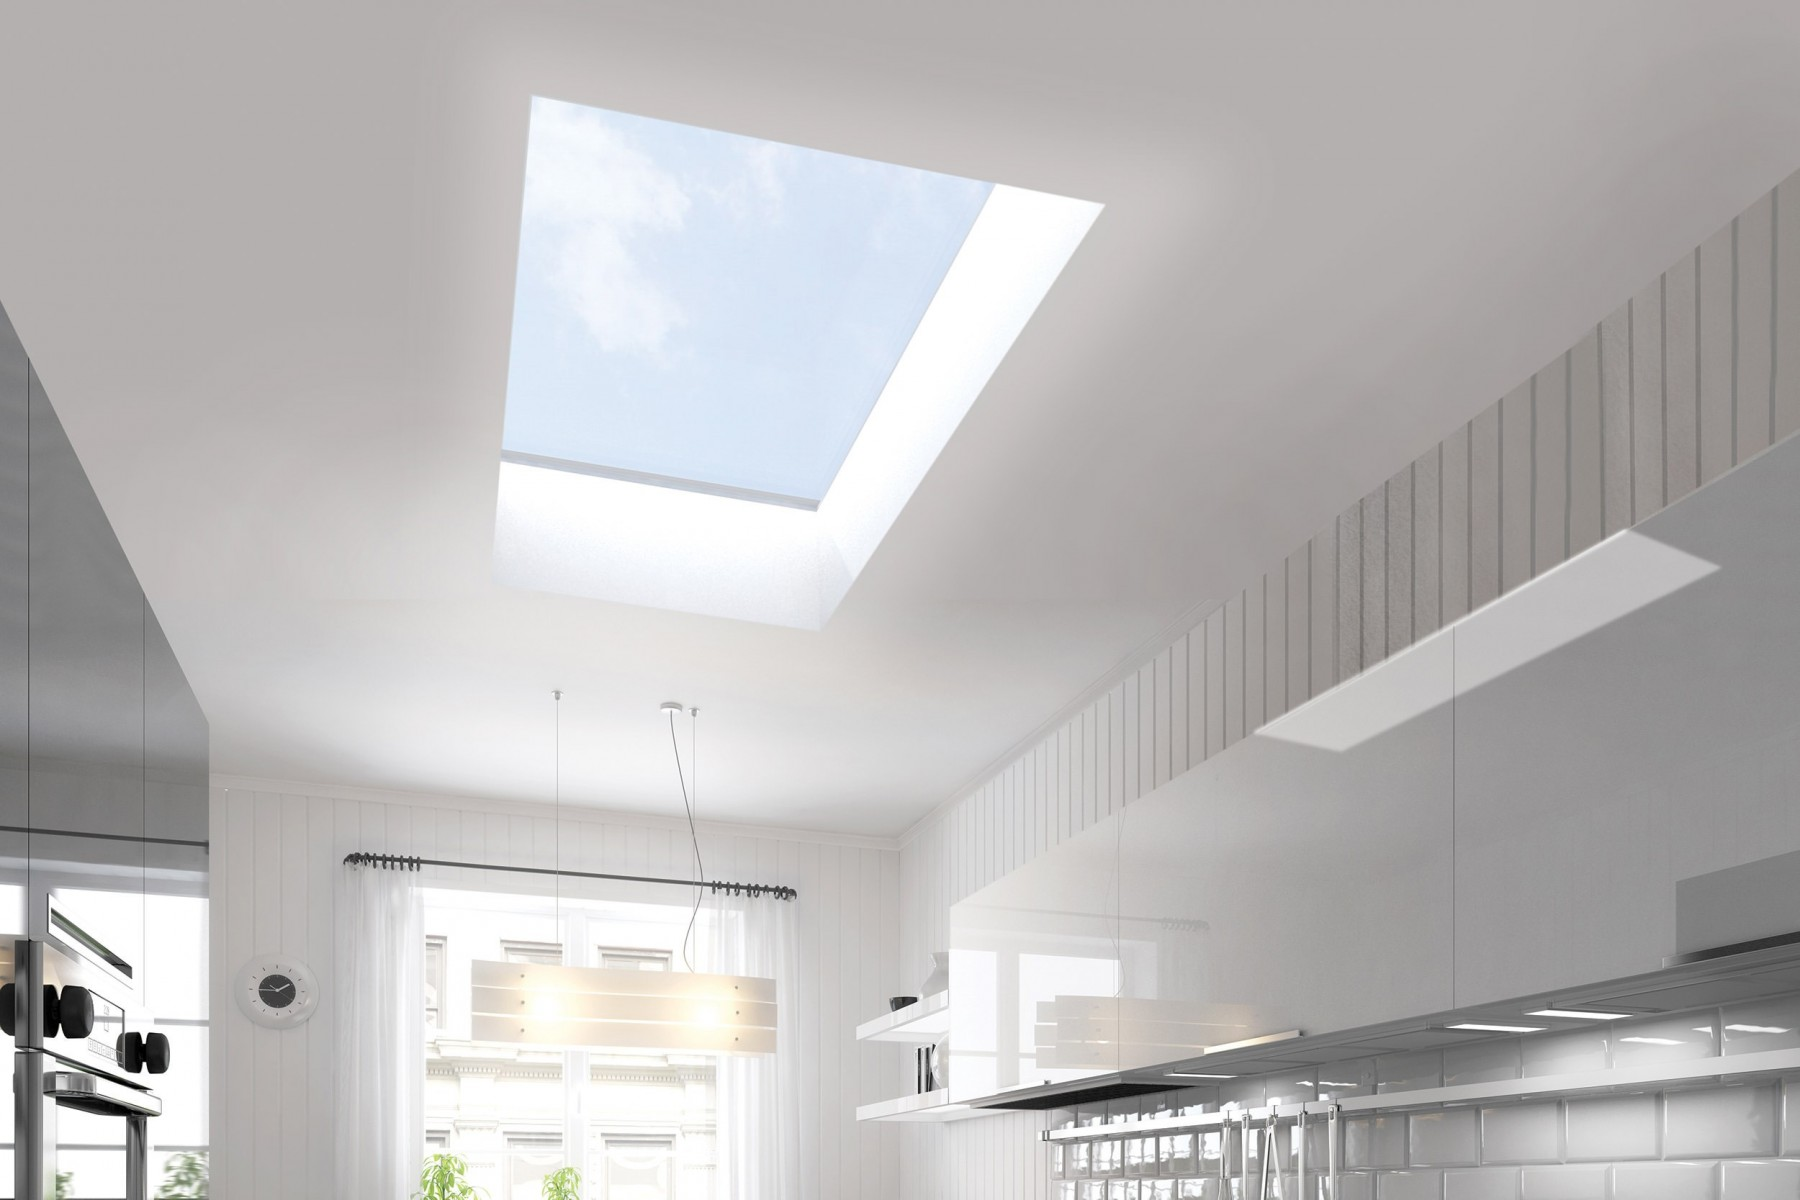 Ultrasky Flat Skylights Ultraframe Roof Systems Shaws